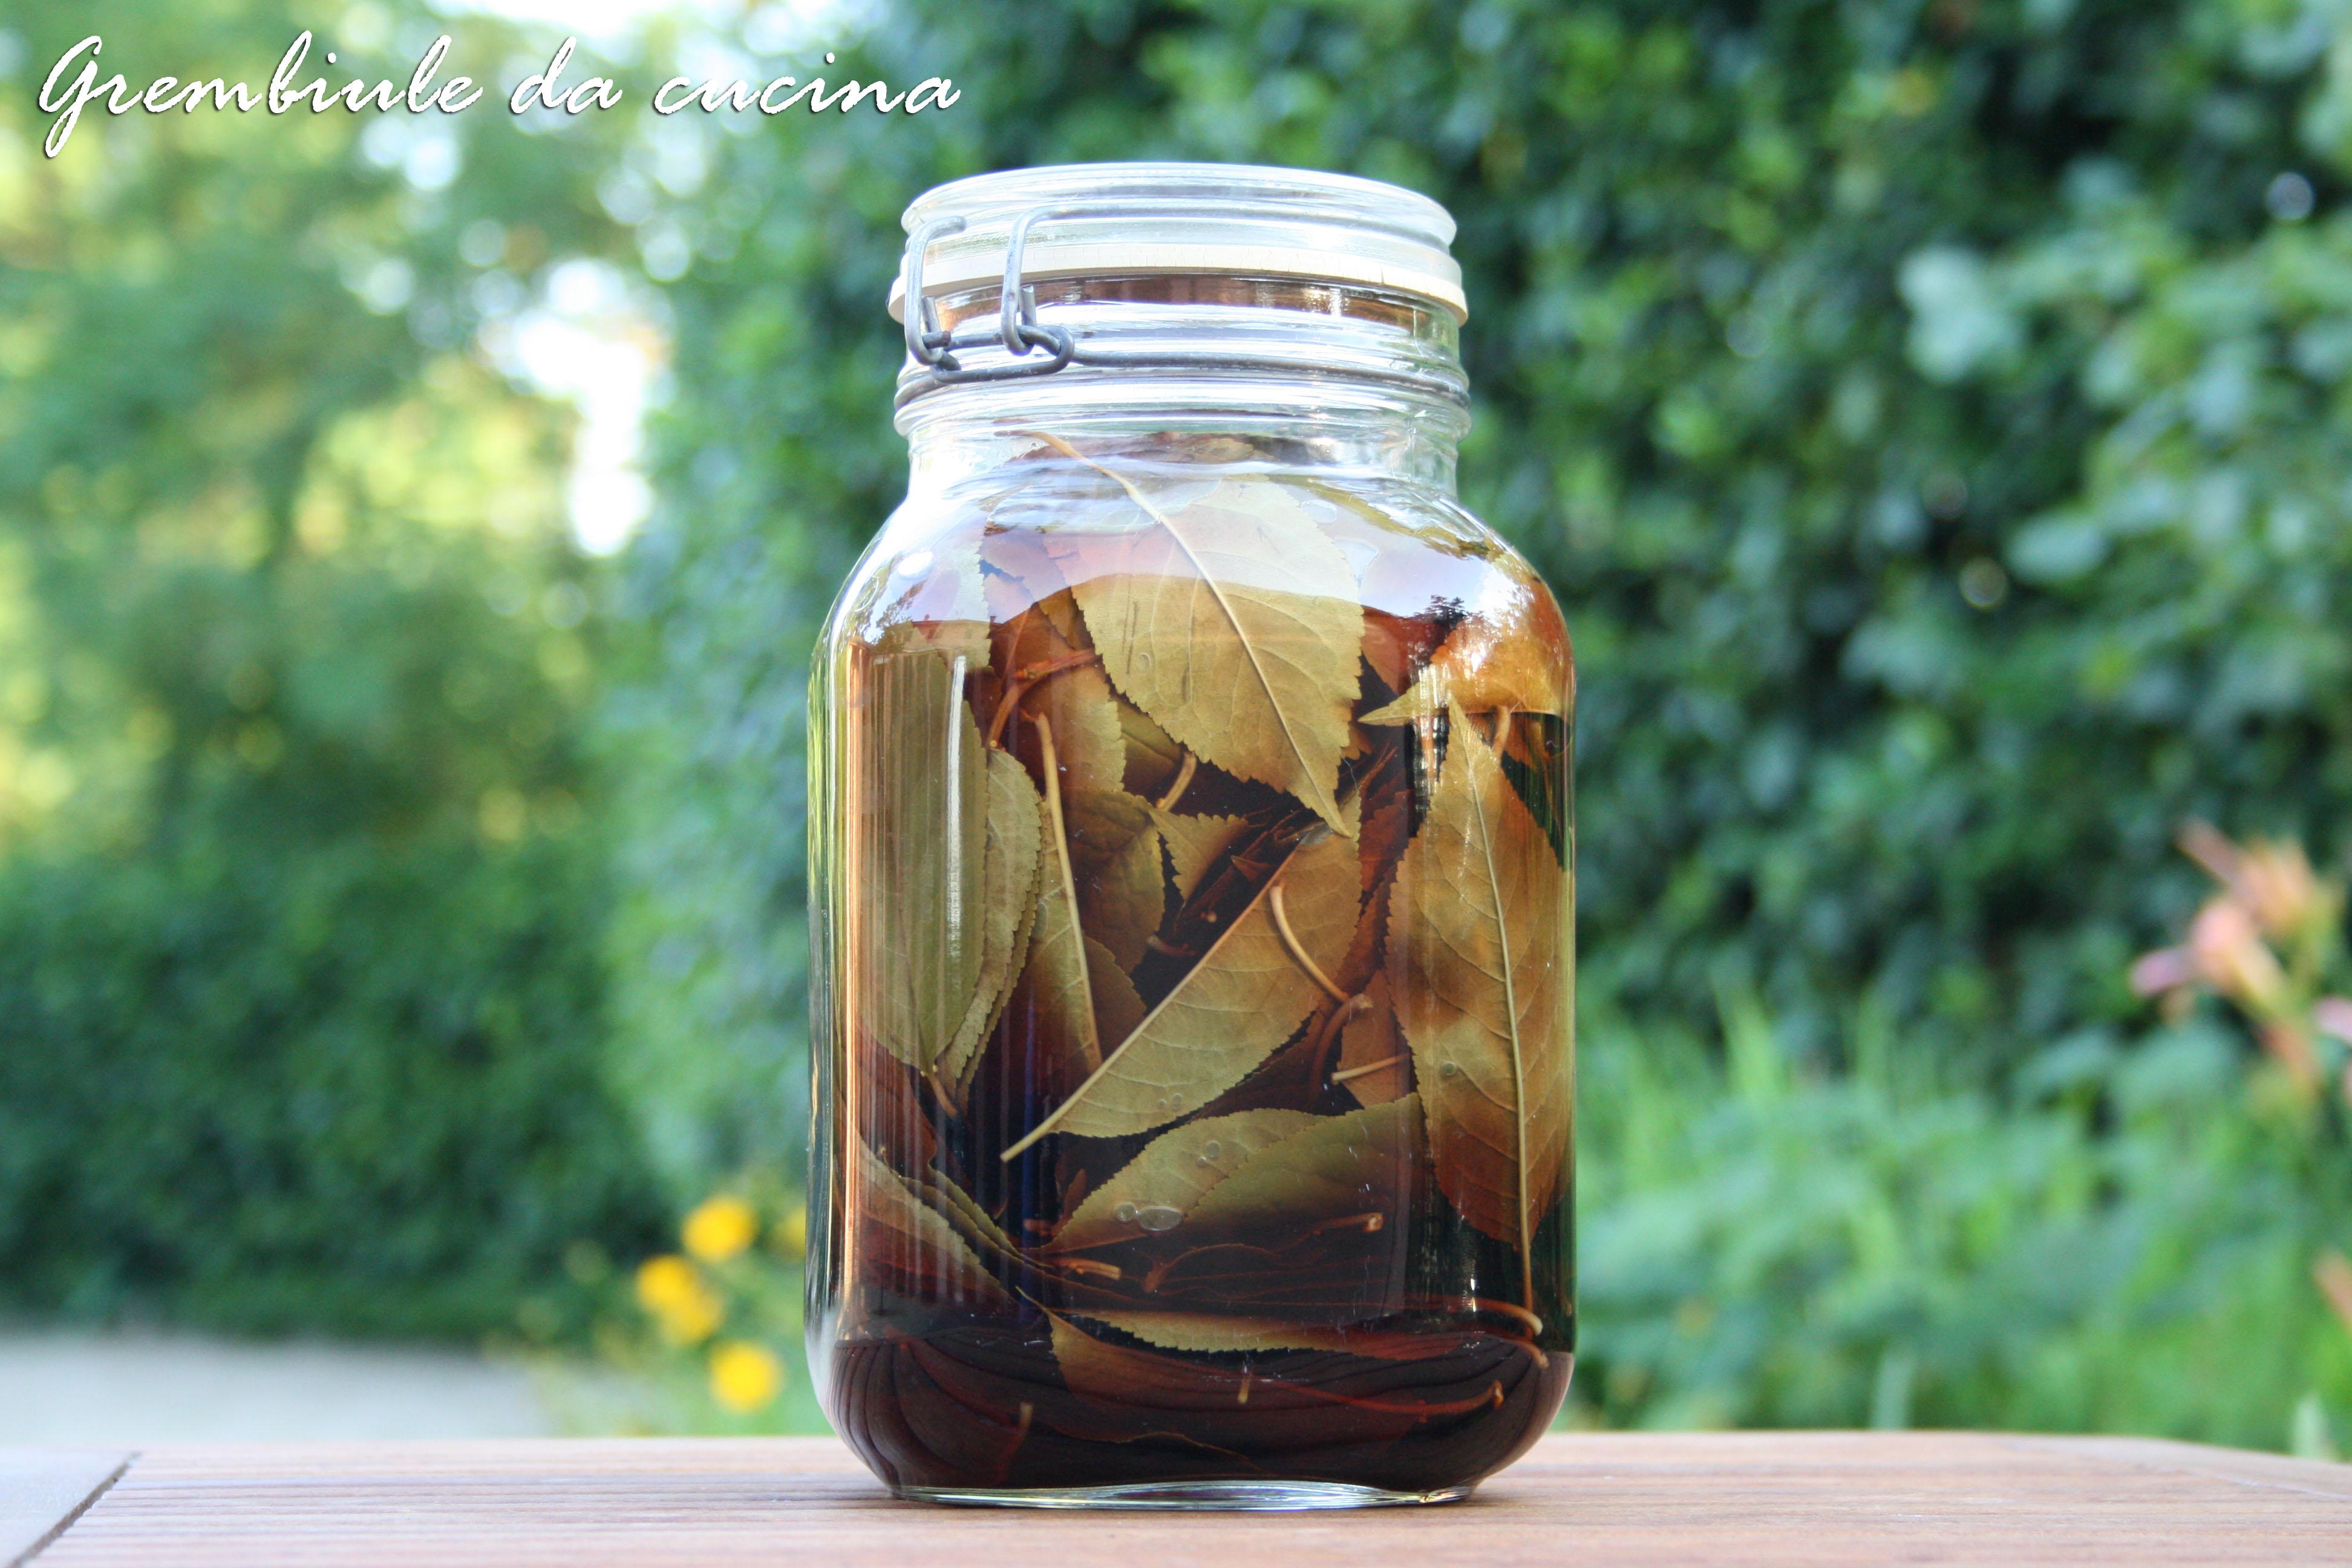 Liquore cento foglie di amarena  Grembiule da cucina